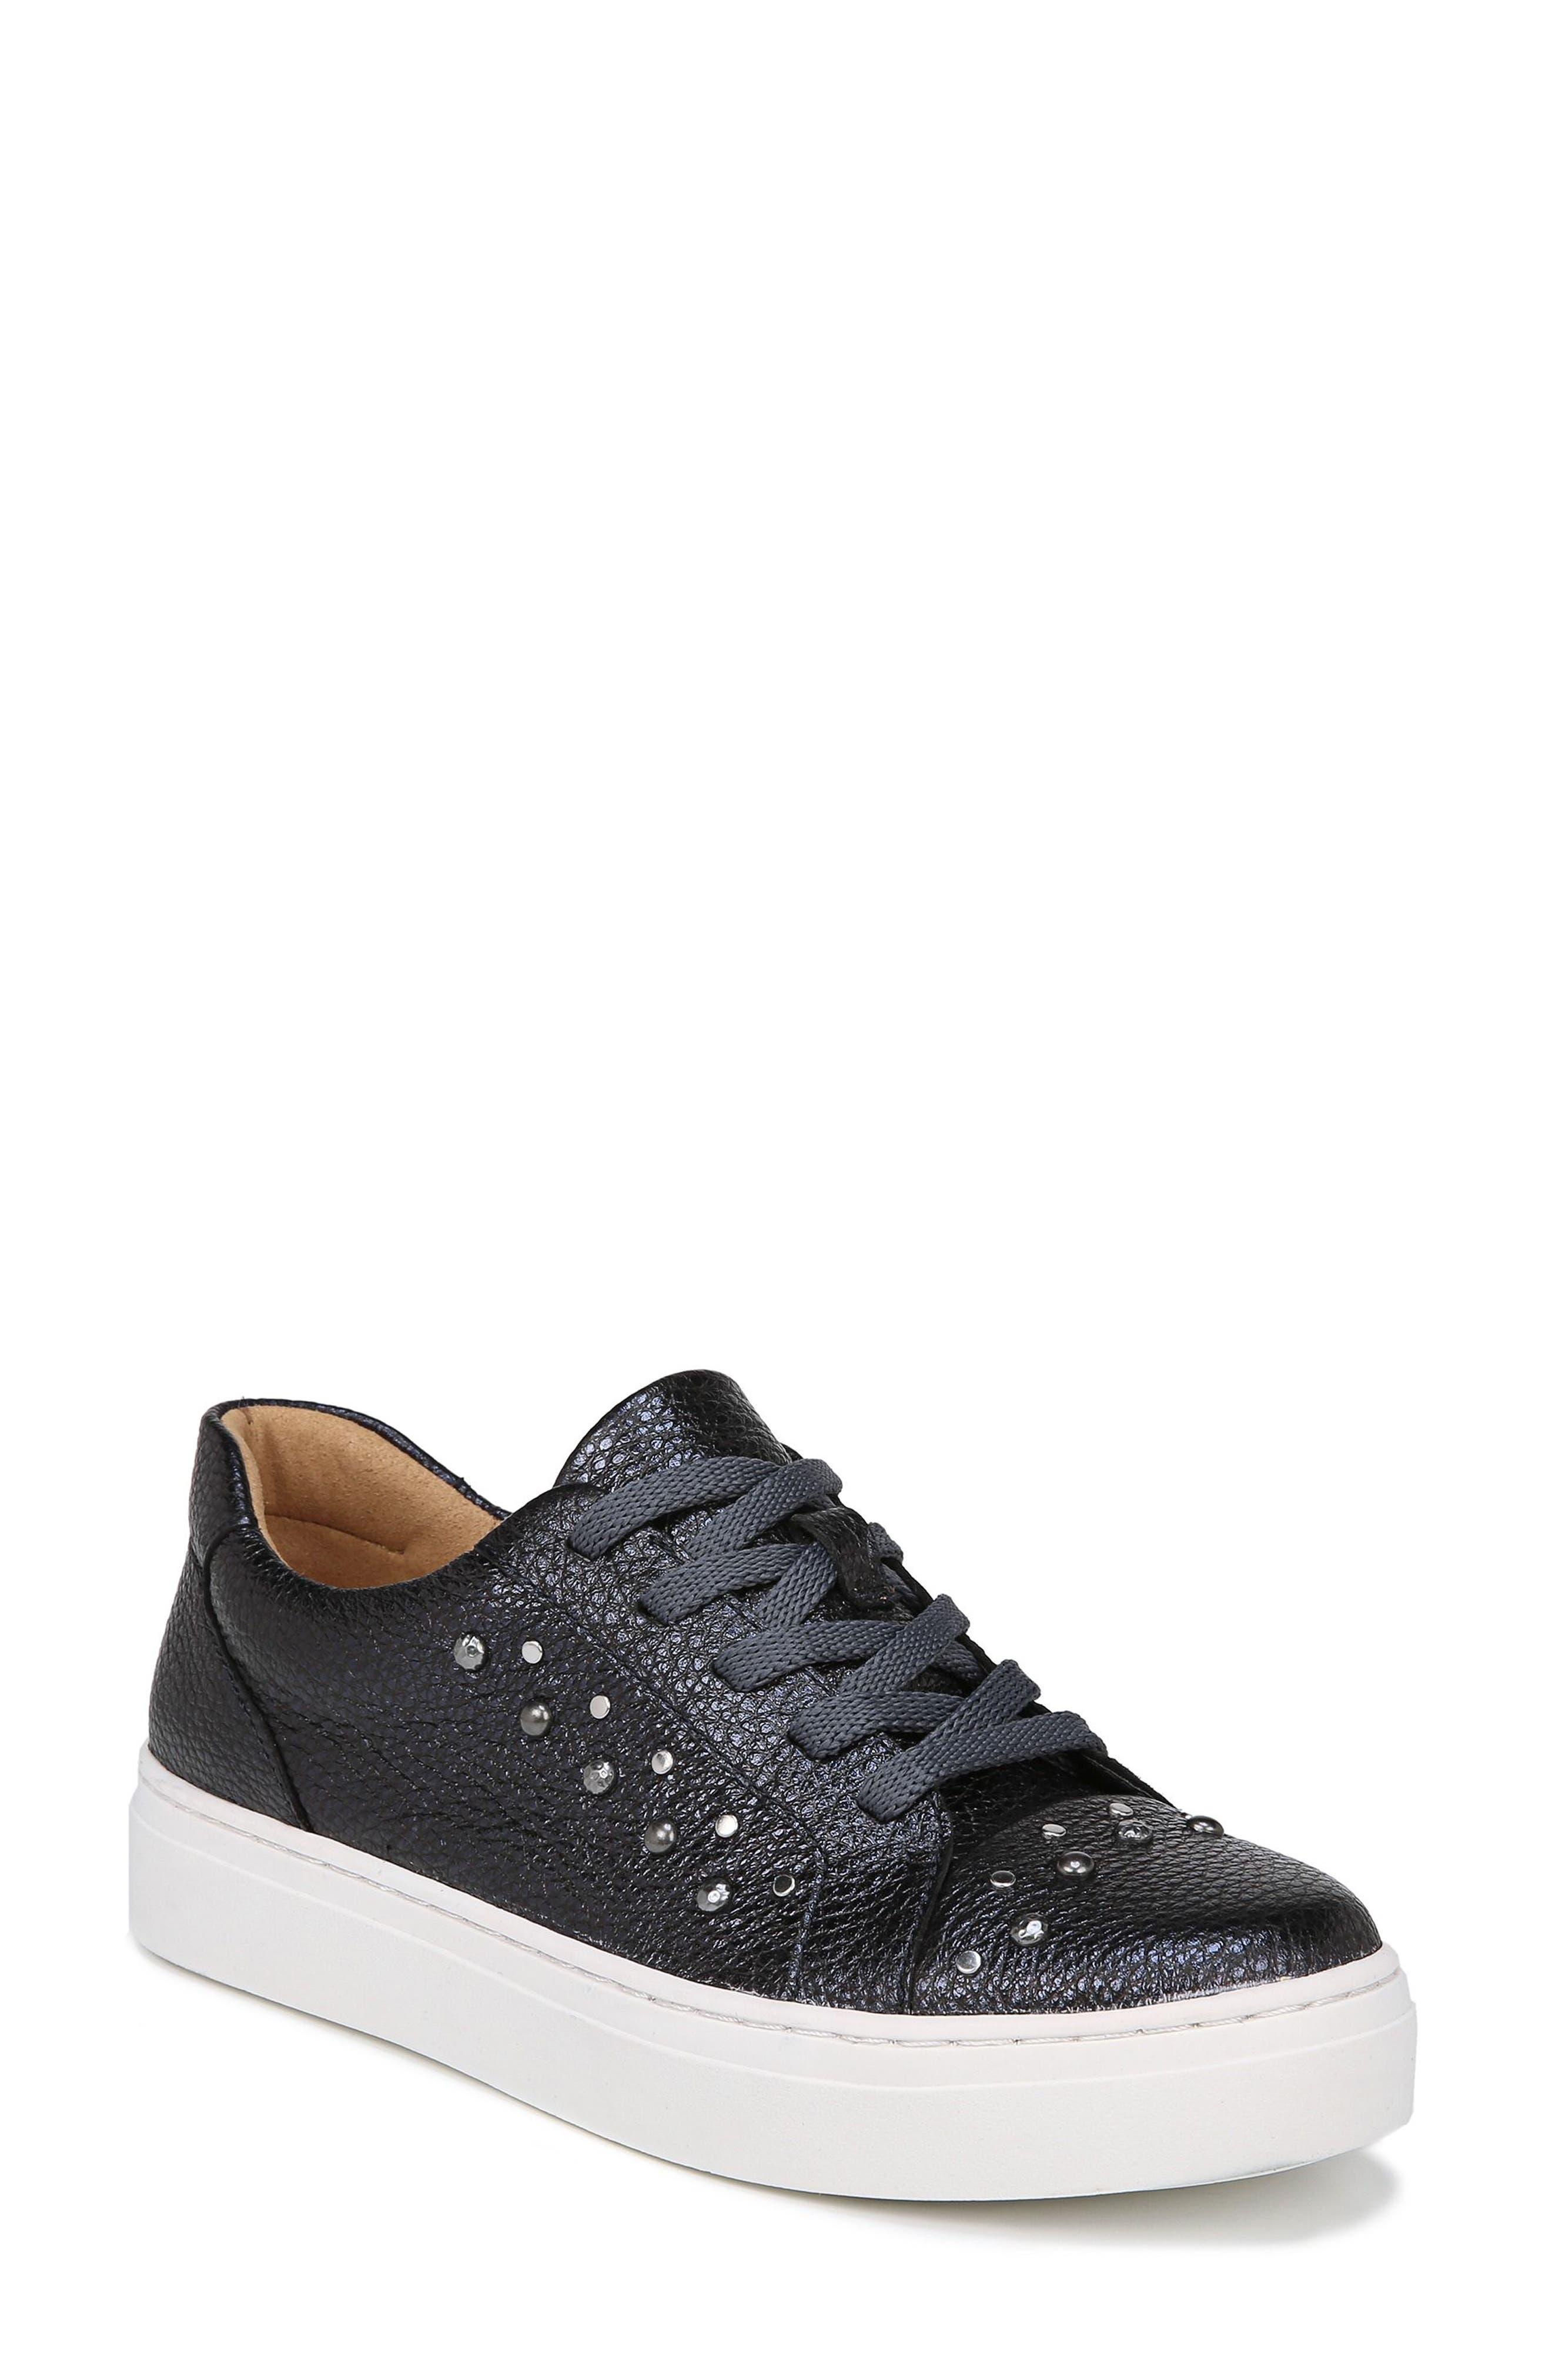 Cairo Sneaker,                         Main,                         color, Blue Metallic Leather